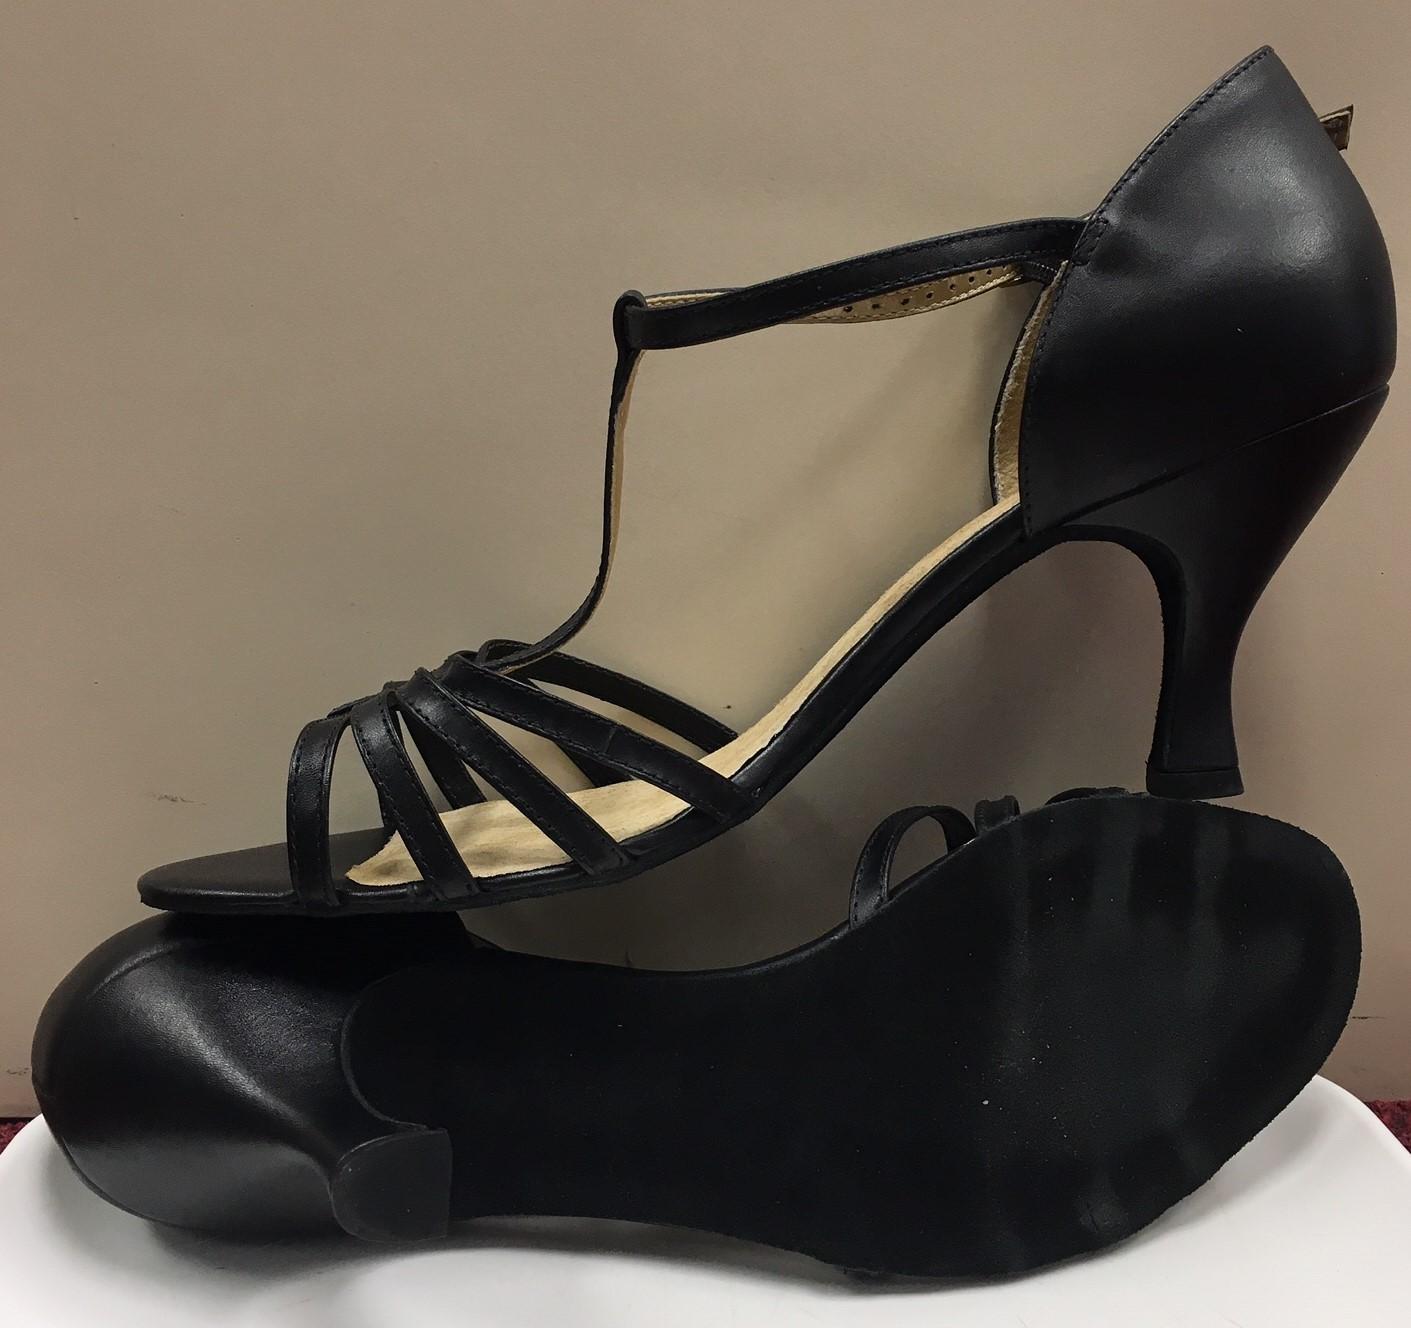 "Danshuz Women's 2.5"" Flared Heel T-Strap Leather Upper Chrome Sole Open Toe Ballroom Shoes"